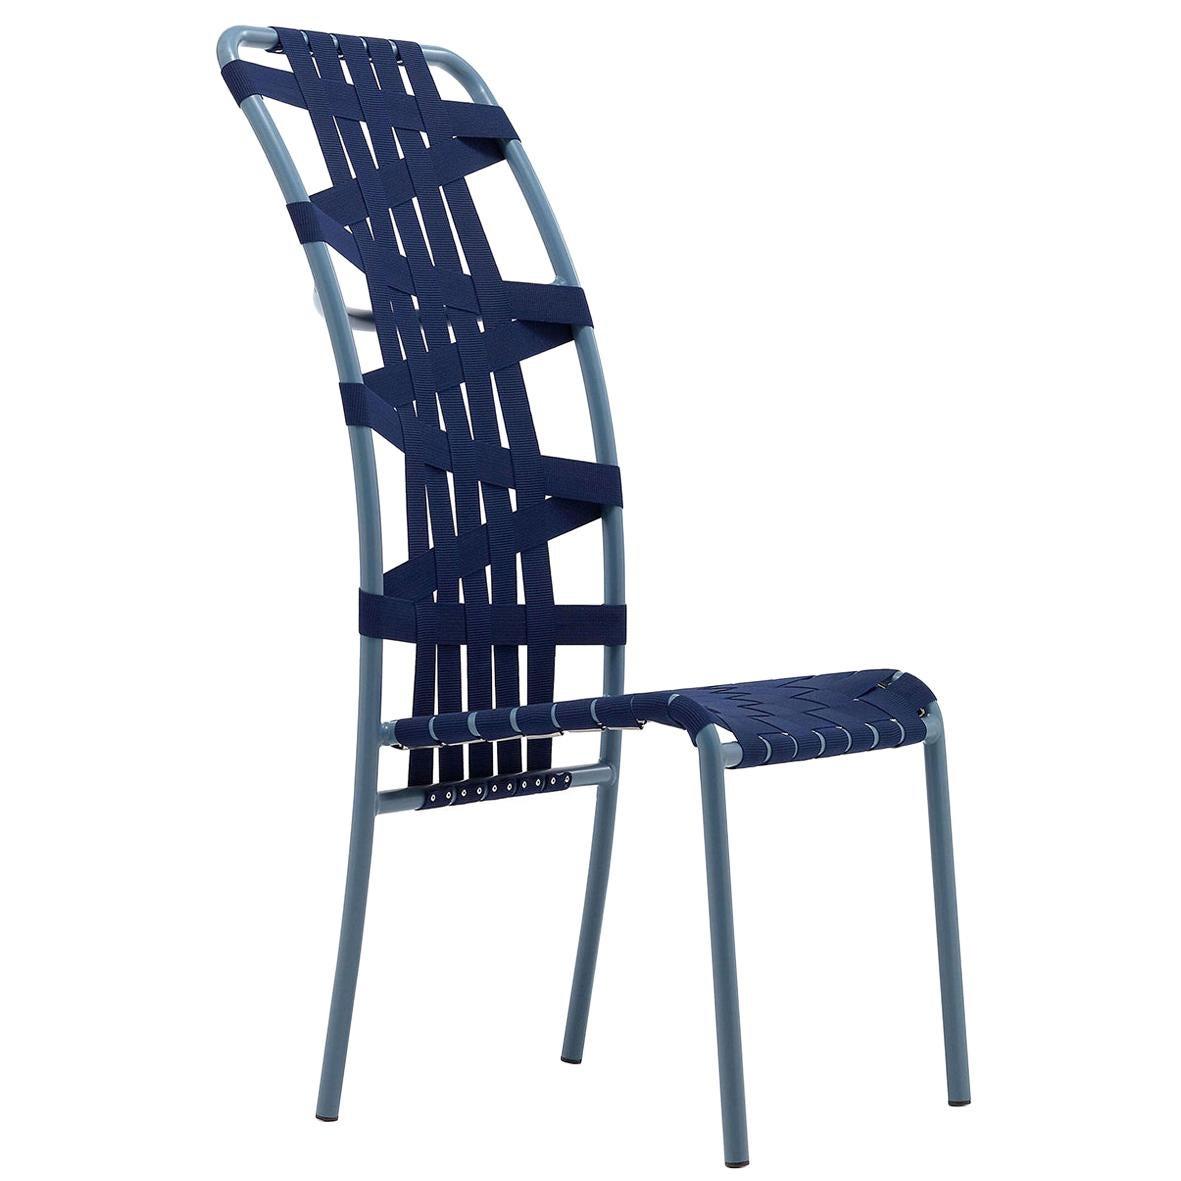 Weaving High Back Chair